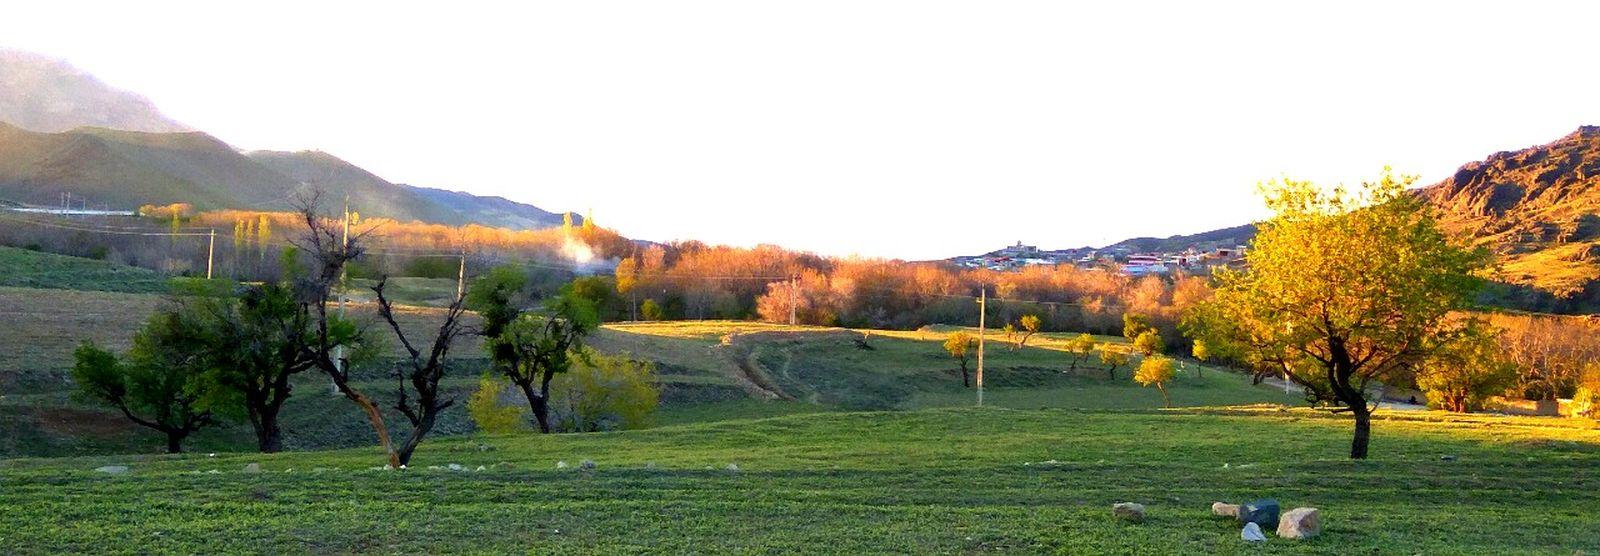 Iran Qom Iran Shot MMB Relaxing With My Love 7pm Golden Hour Panoramic Good Feeling این ازون عکساست که وقتی چشمت بهش میفته لبخند به لبت میشینه!